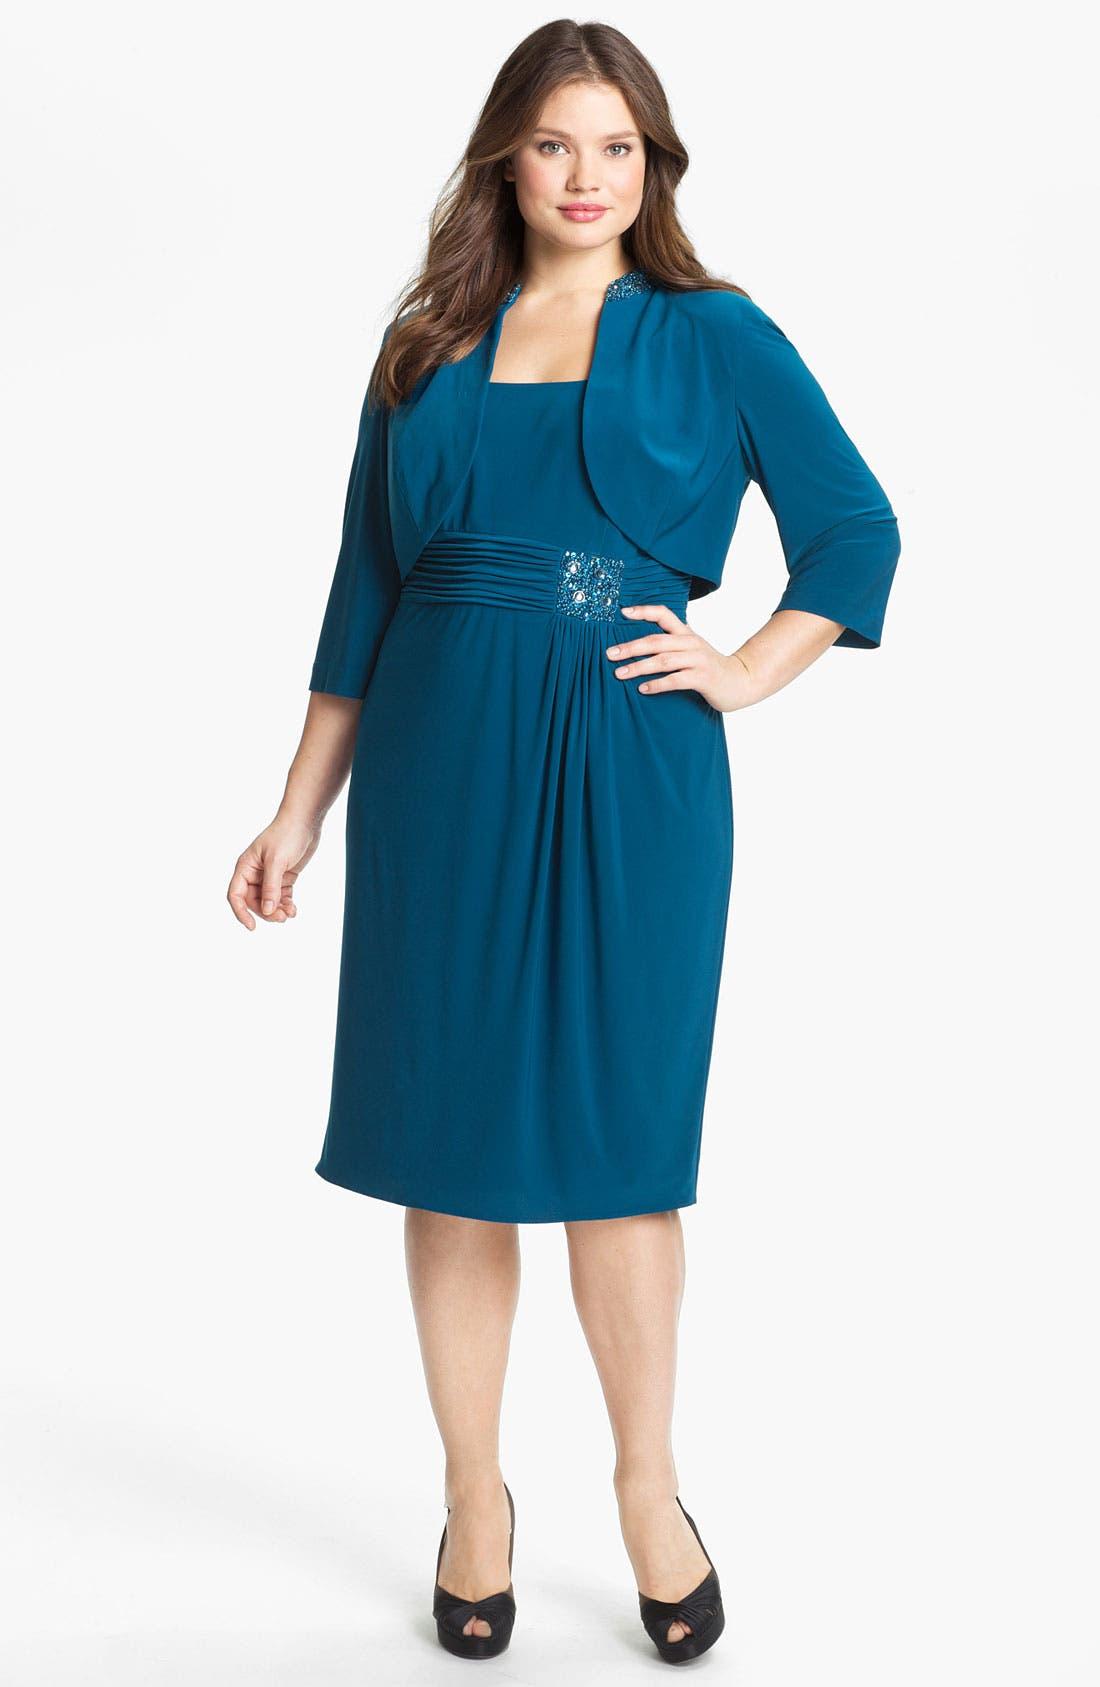 Main Image - Alex Evenings Embellished Jersey Dress & Bolero (Plus Size)